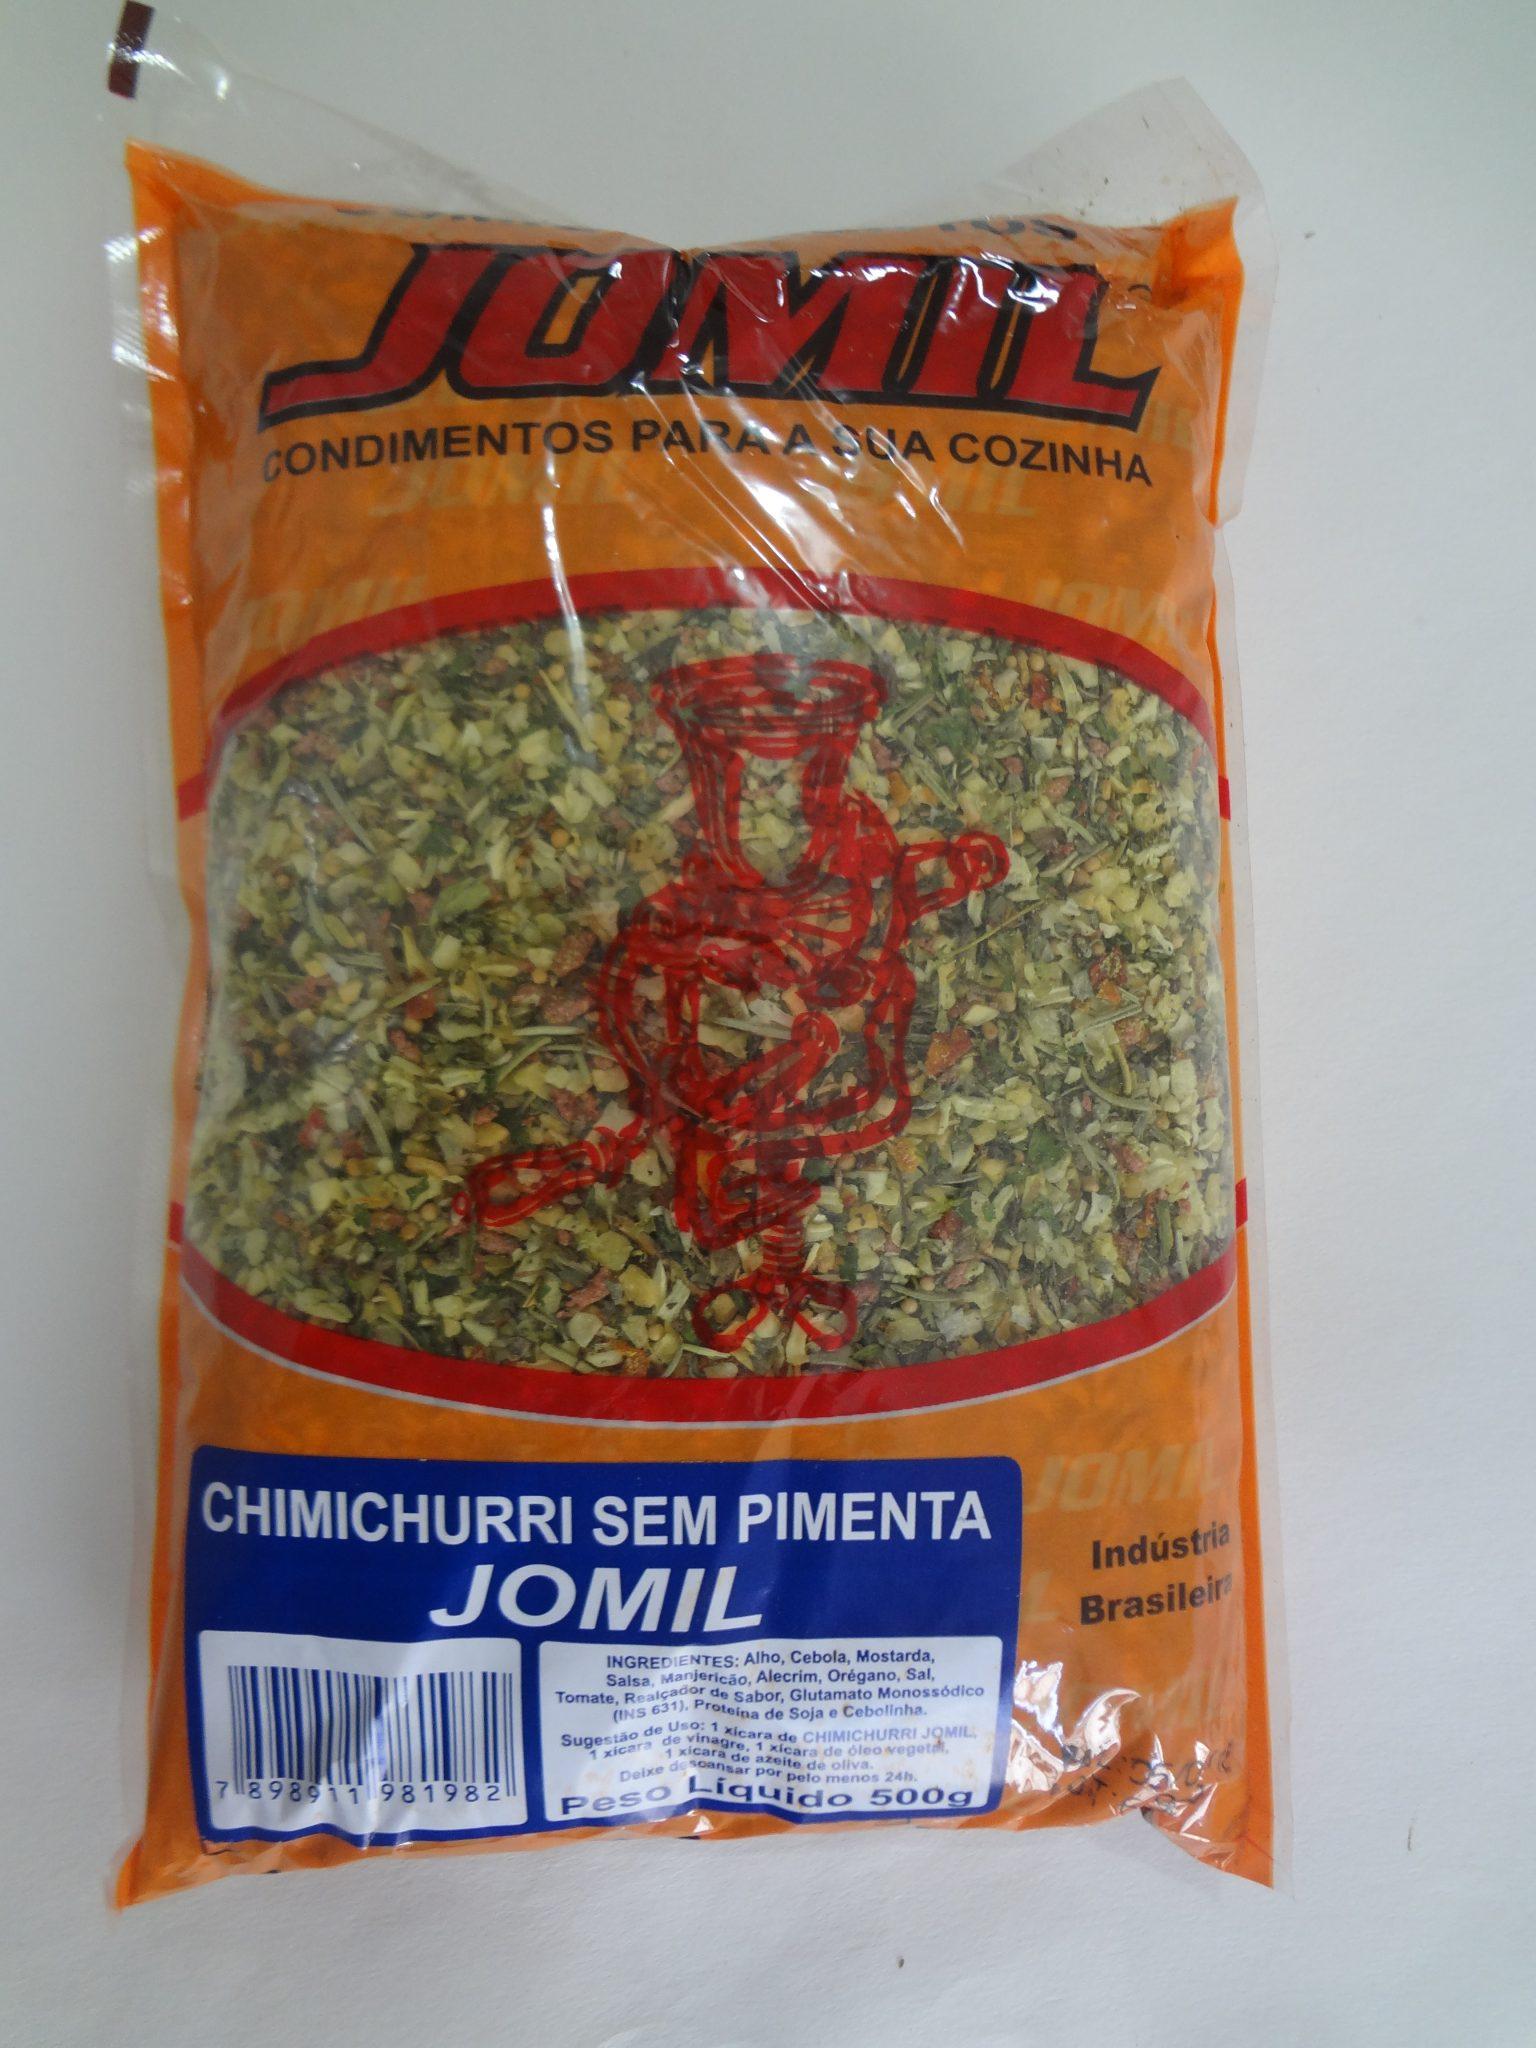 Chimichurri sem Pimenta Jomil